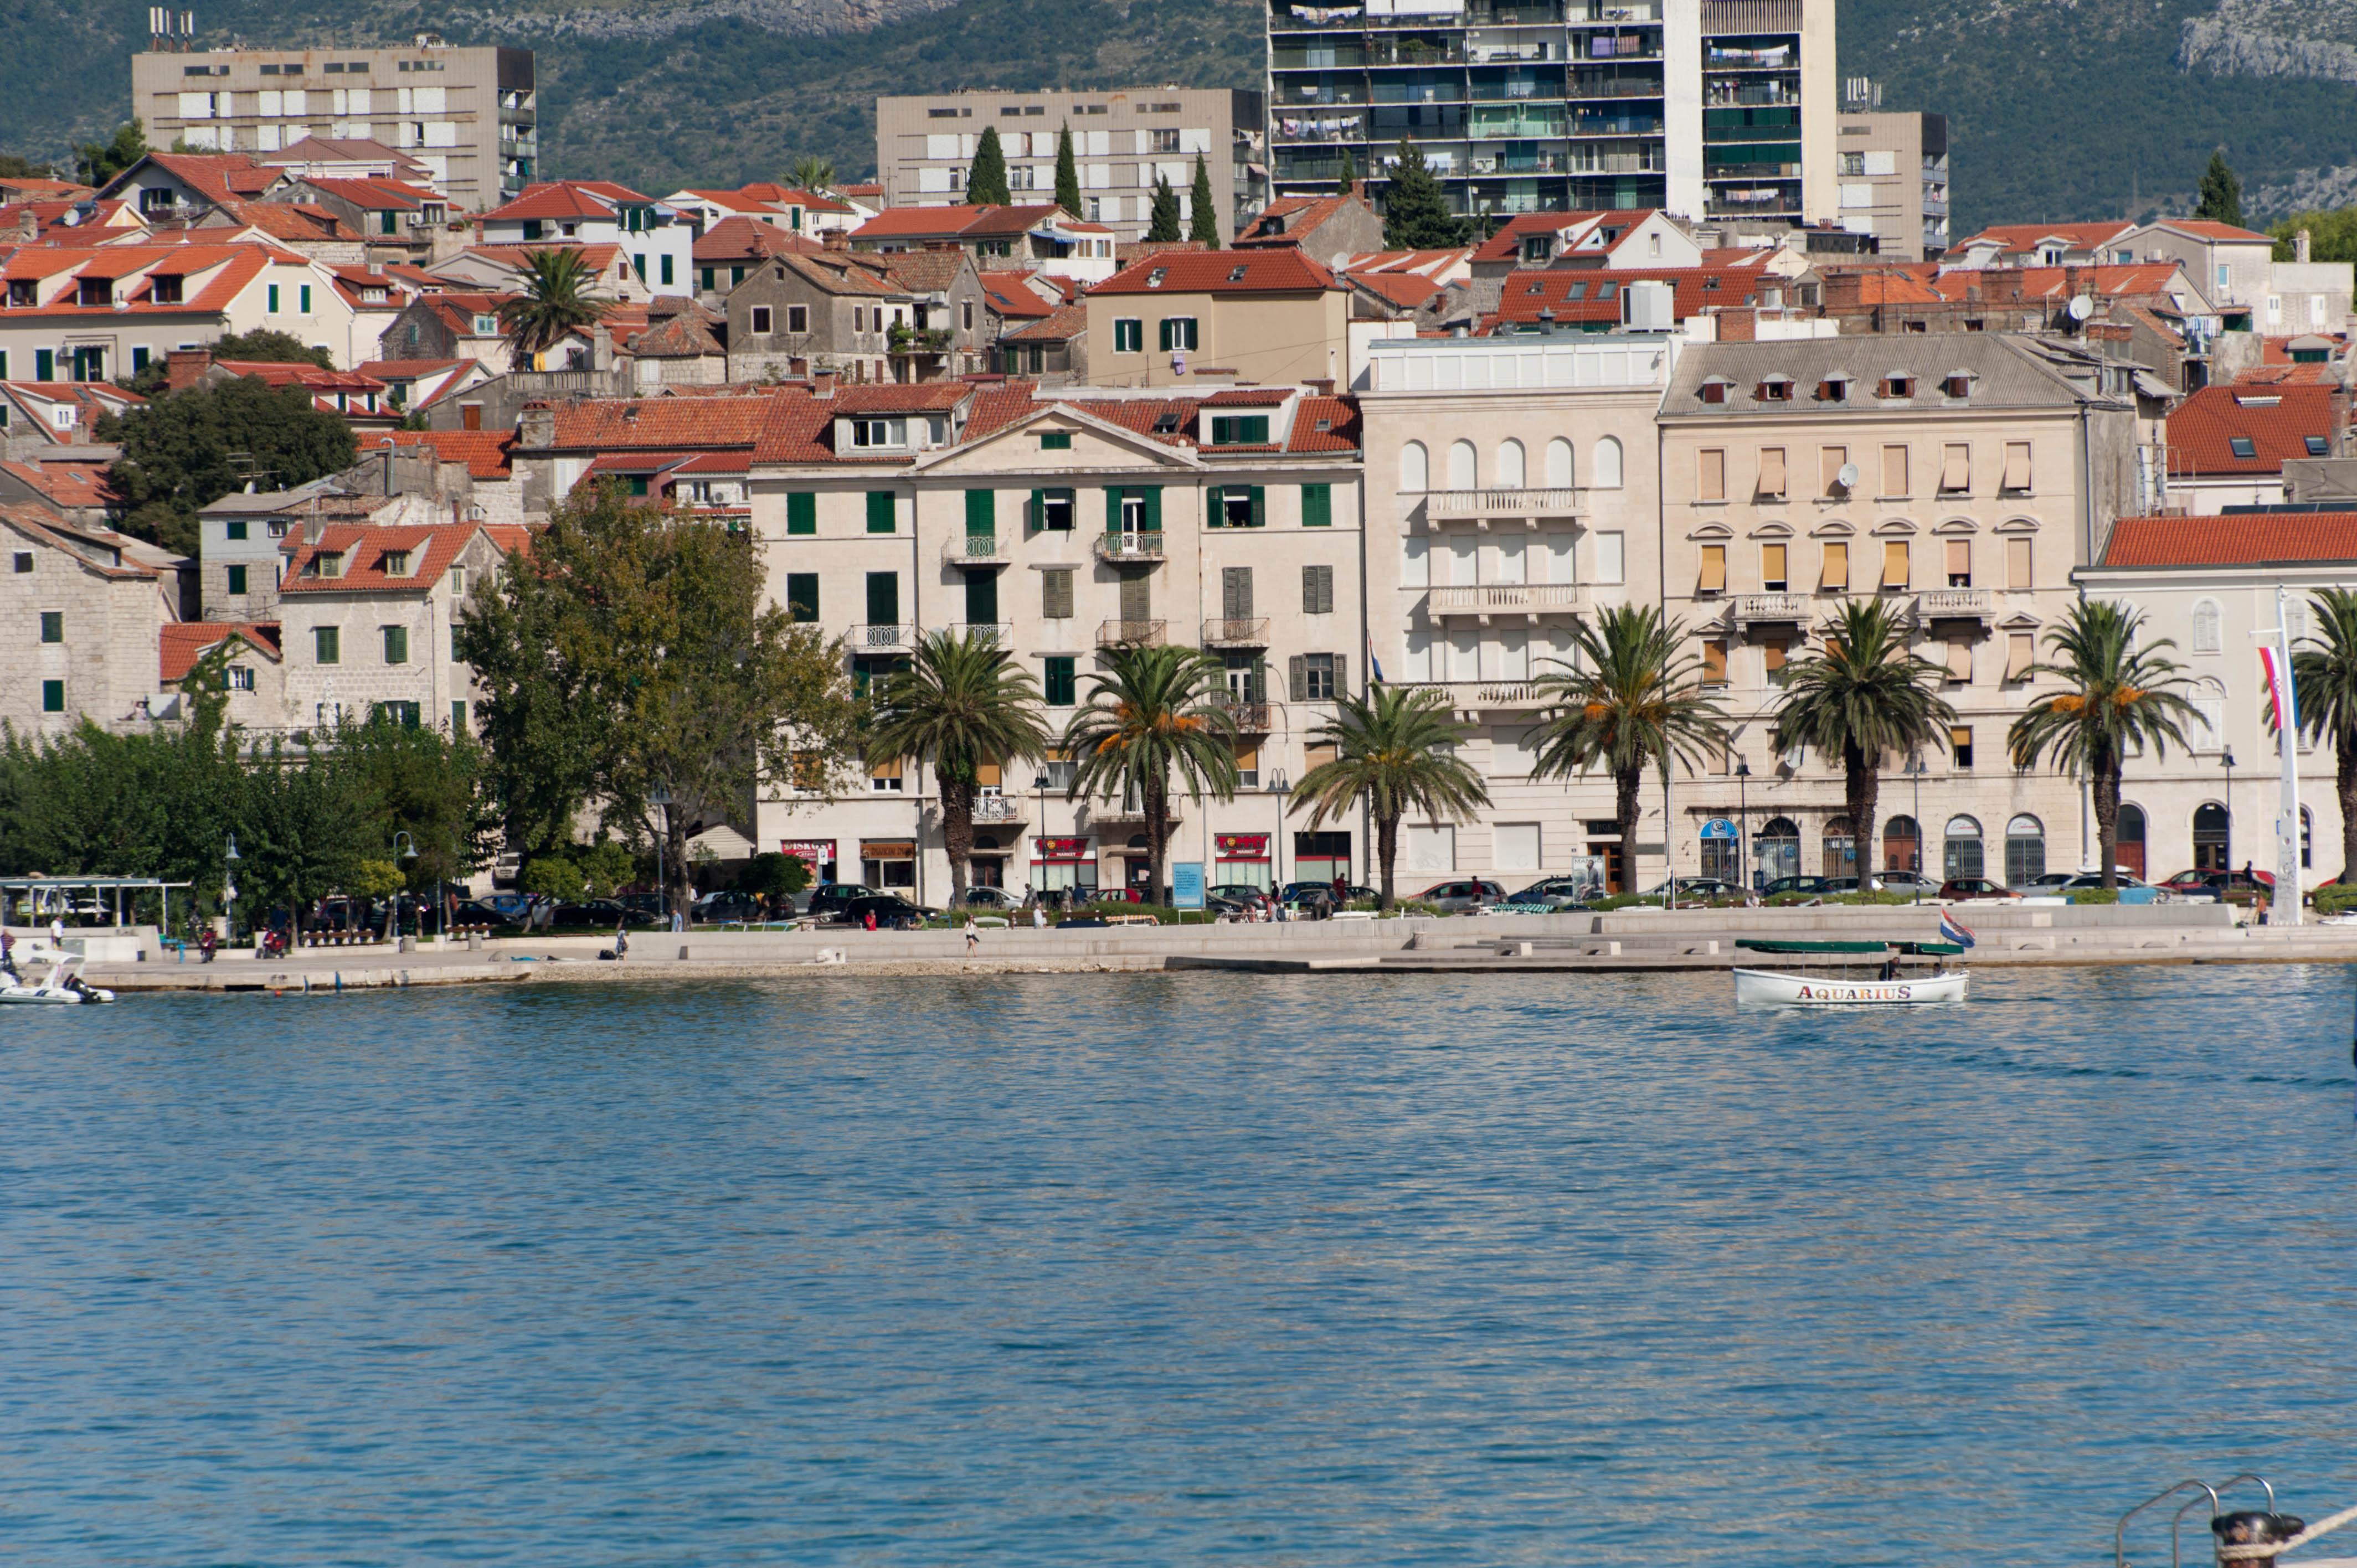 9810-Split (Dalmatie centrale)